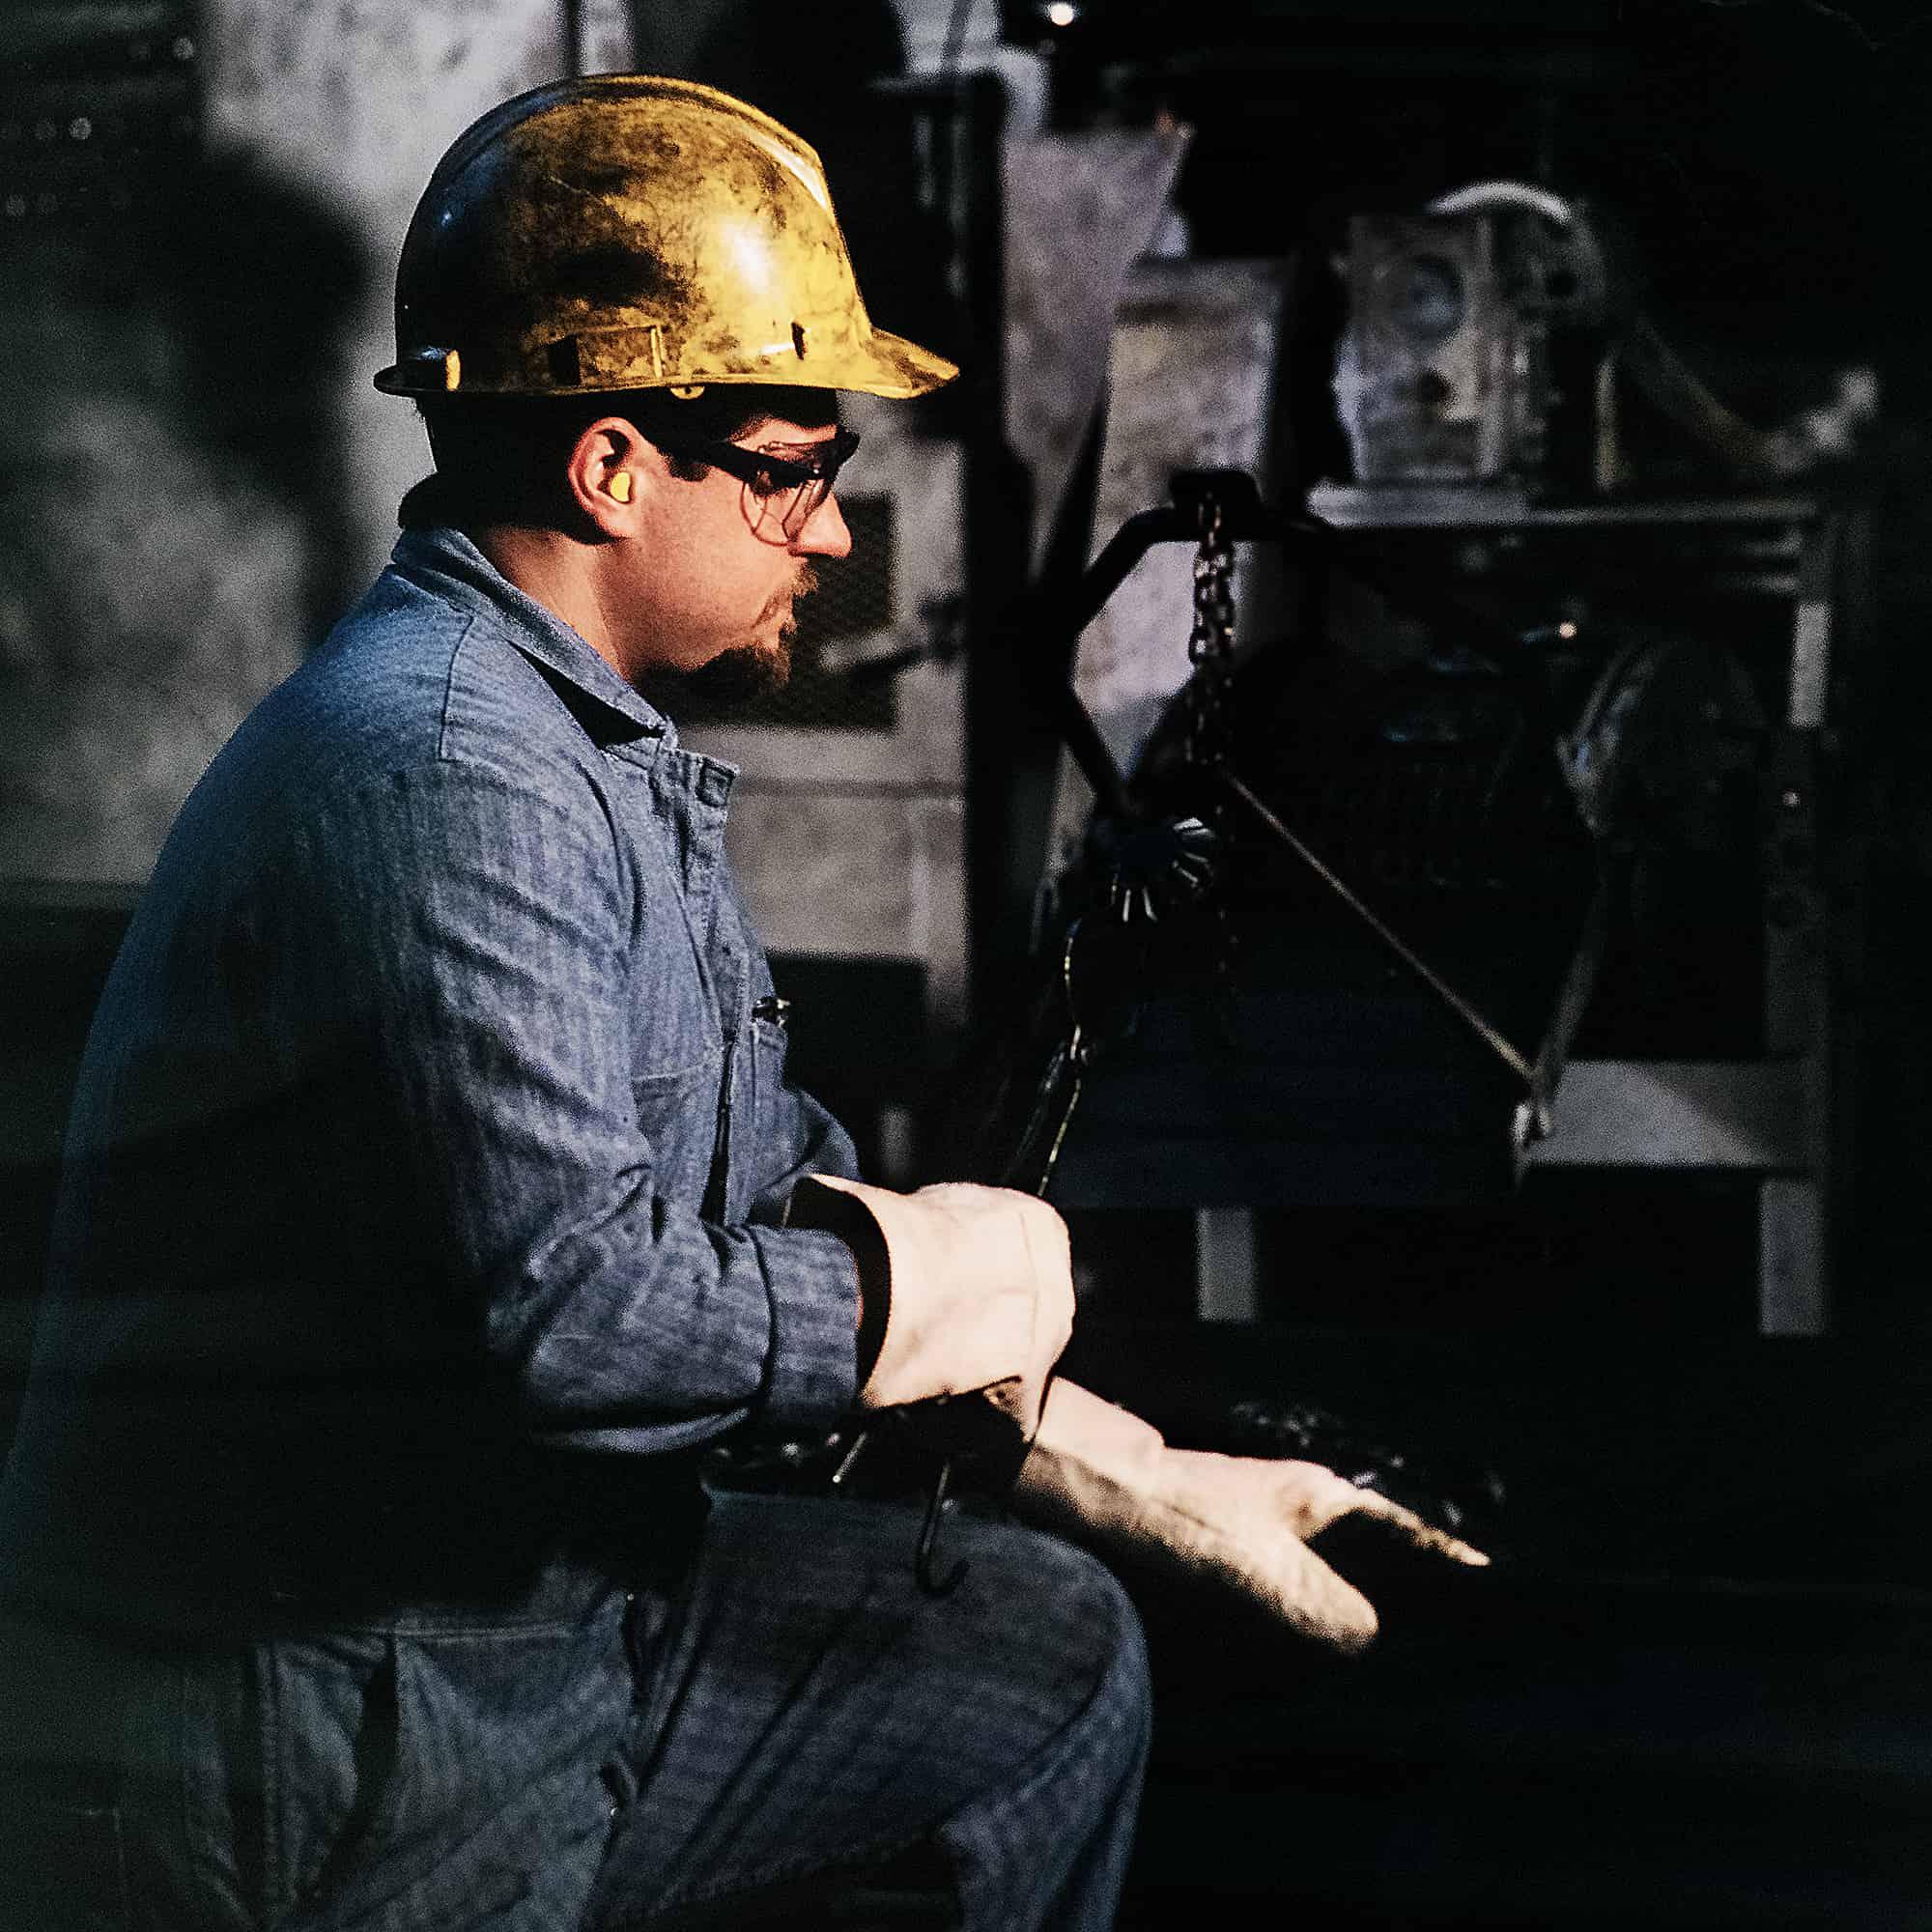 detroit-industrial-photographer